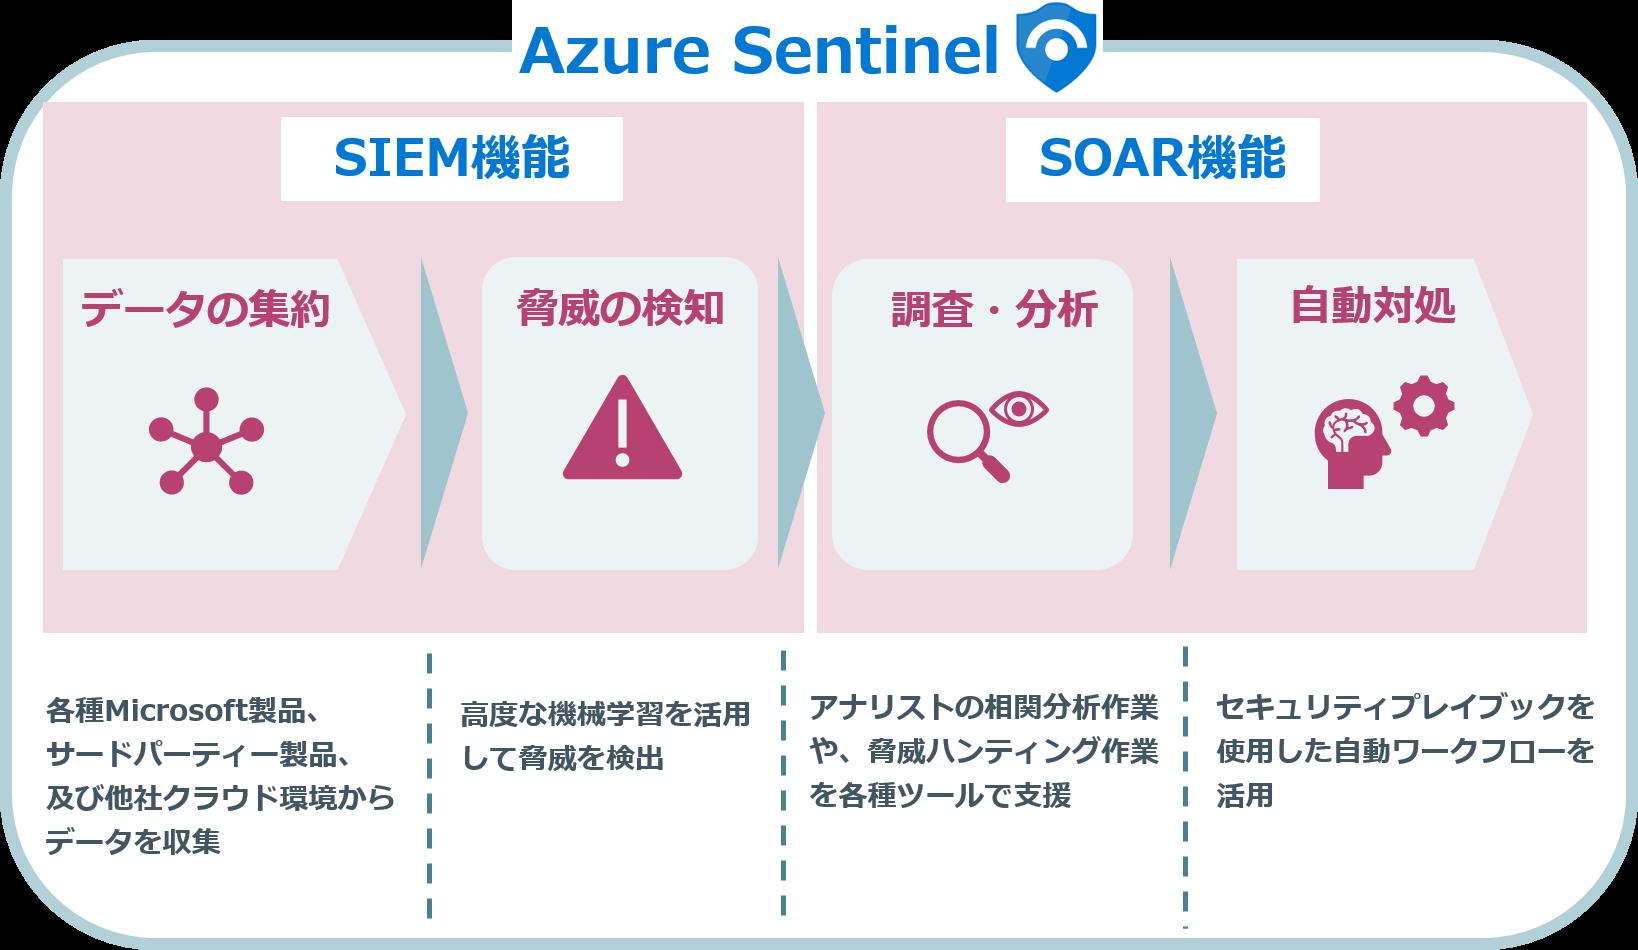 Azure Sentinel概要